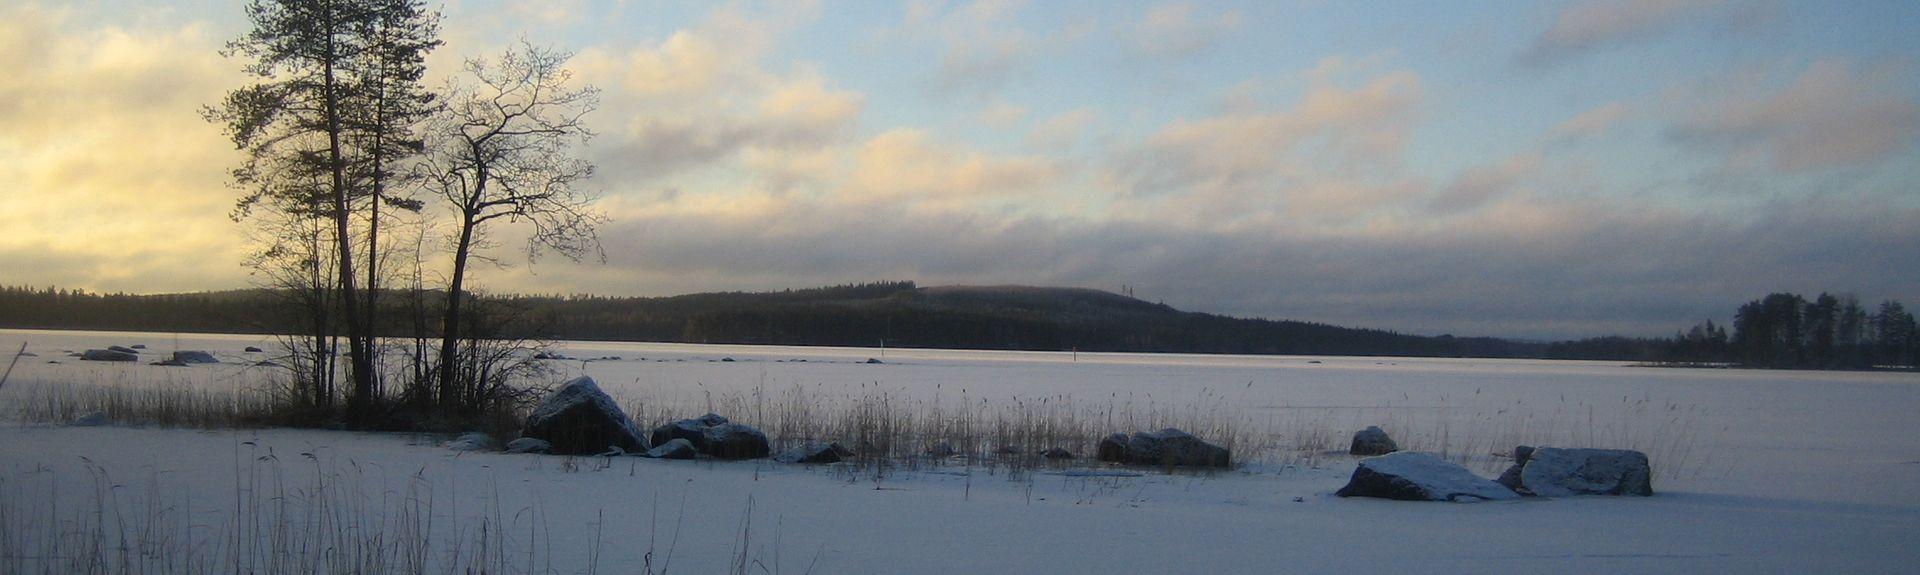 Northern Savonia, Finland